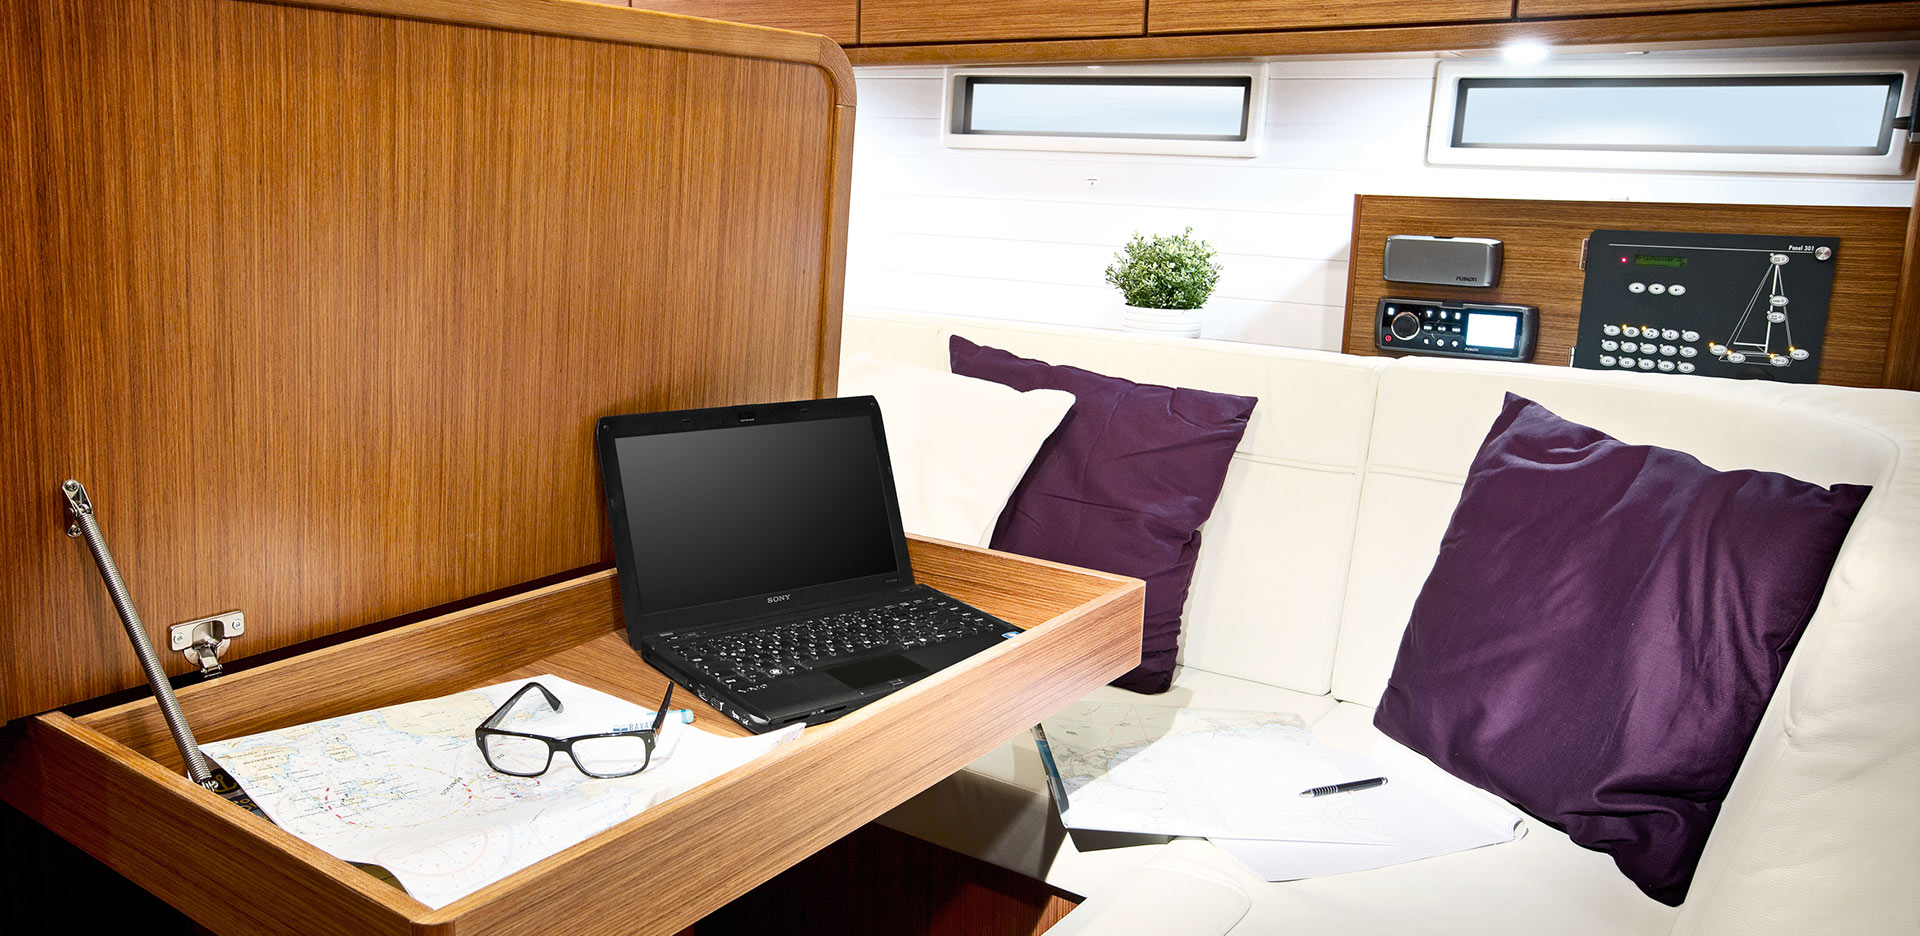 Livig-room-Inchiriere-Petreceri-Croaziere-Vacante-Yacht-Bavaria-Cruise46_4